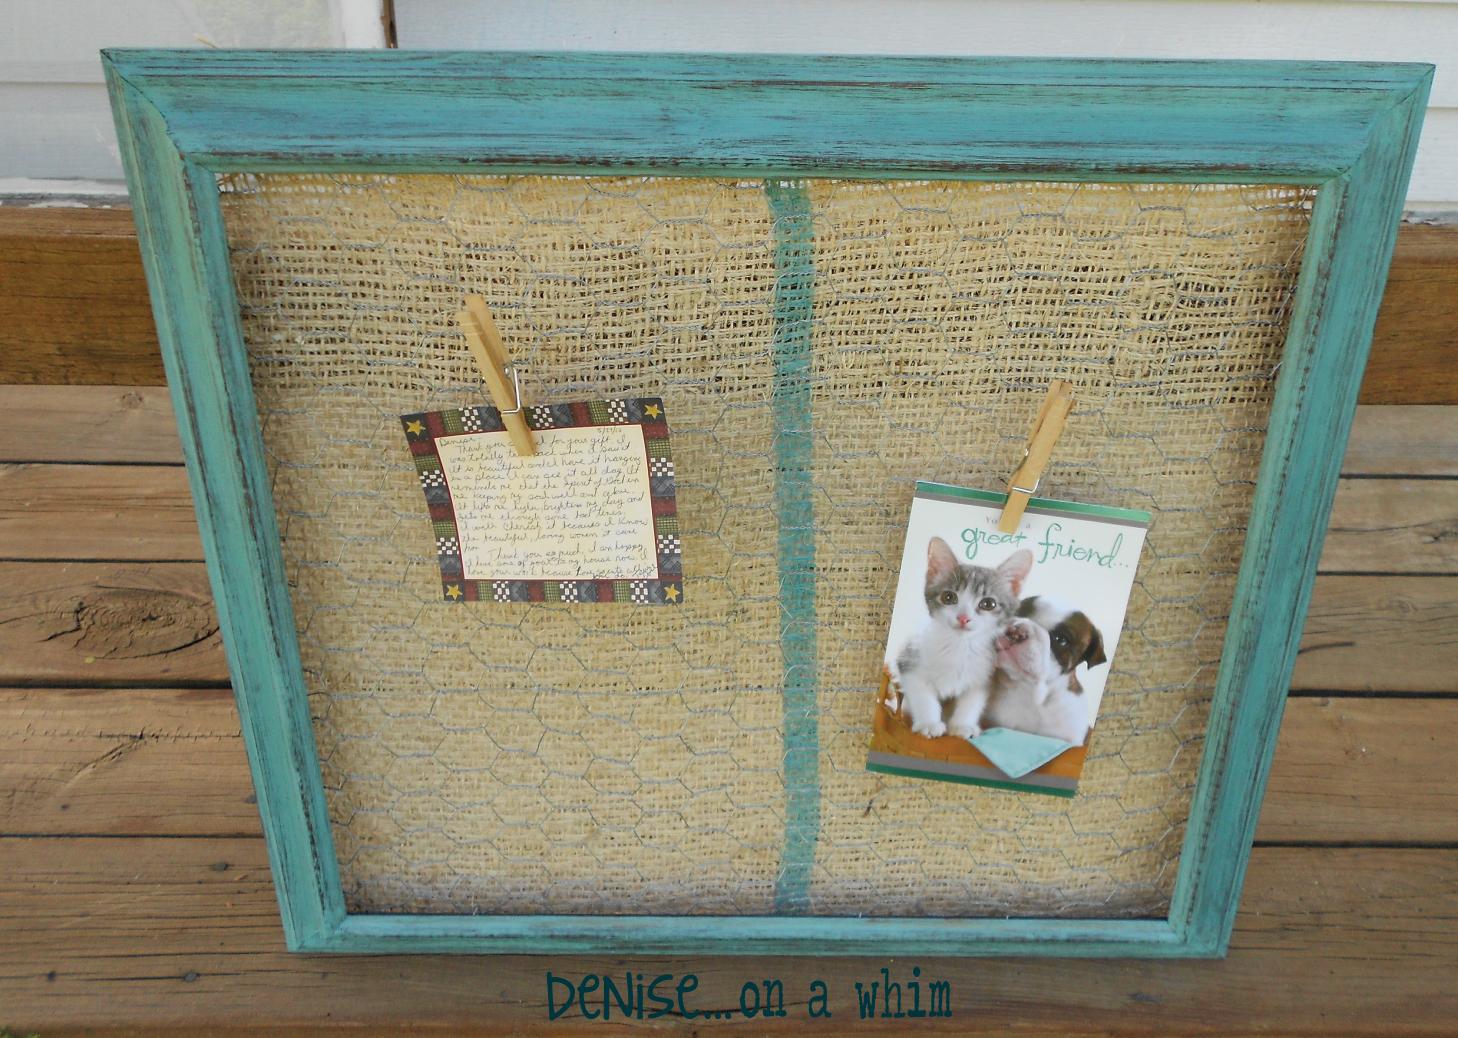 denise...on a whim: Chicken Wire Memo Board